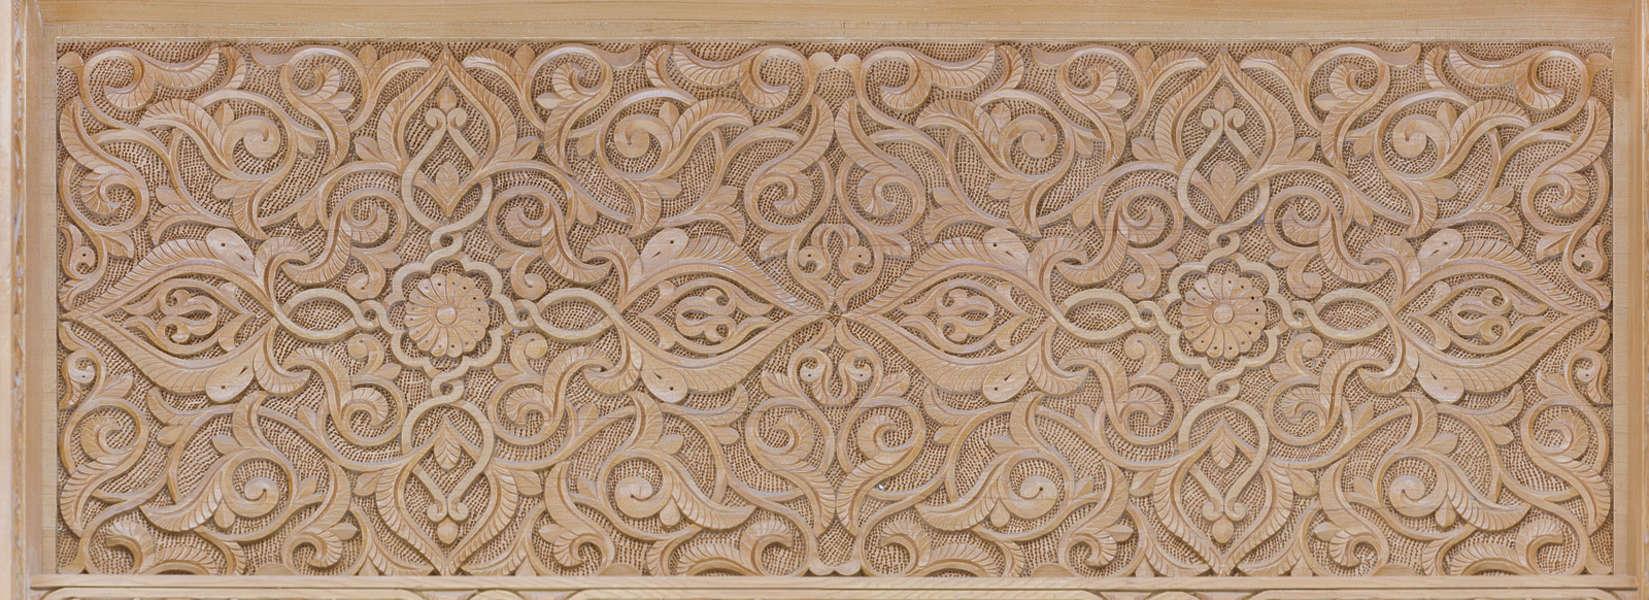 Ornamentsmoorishwood0100 Free Background Texture